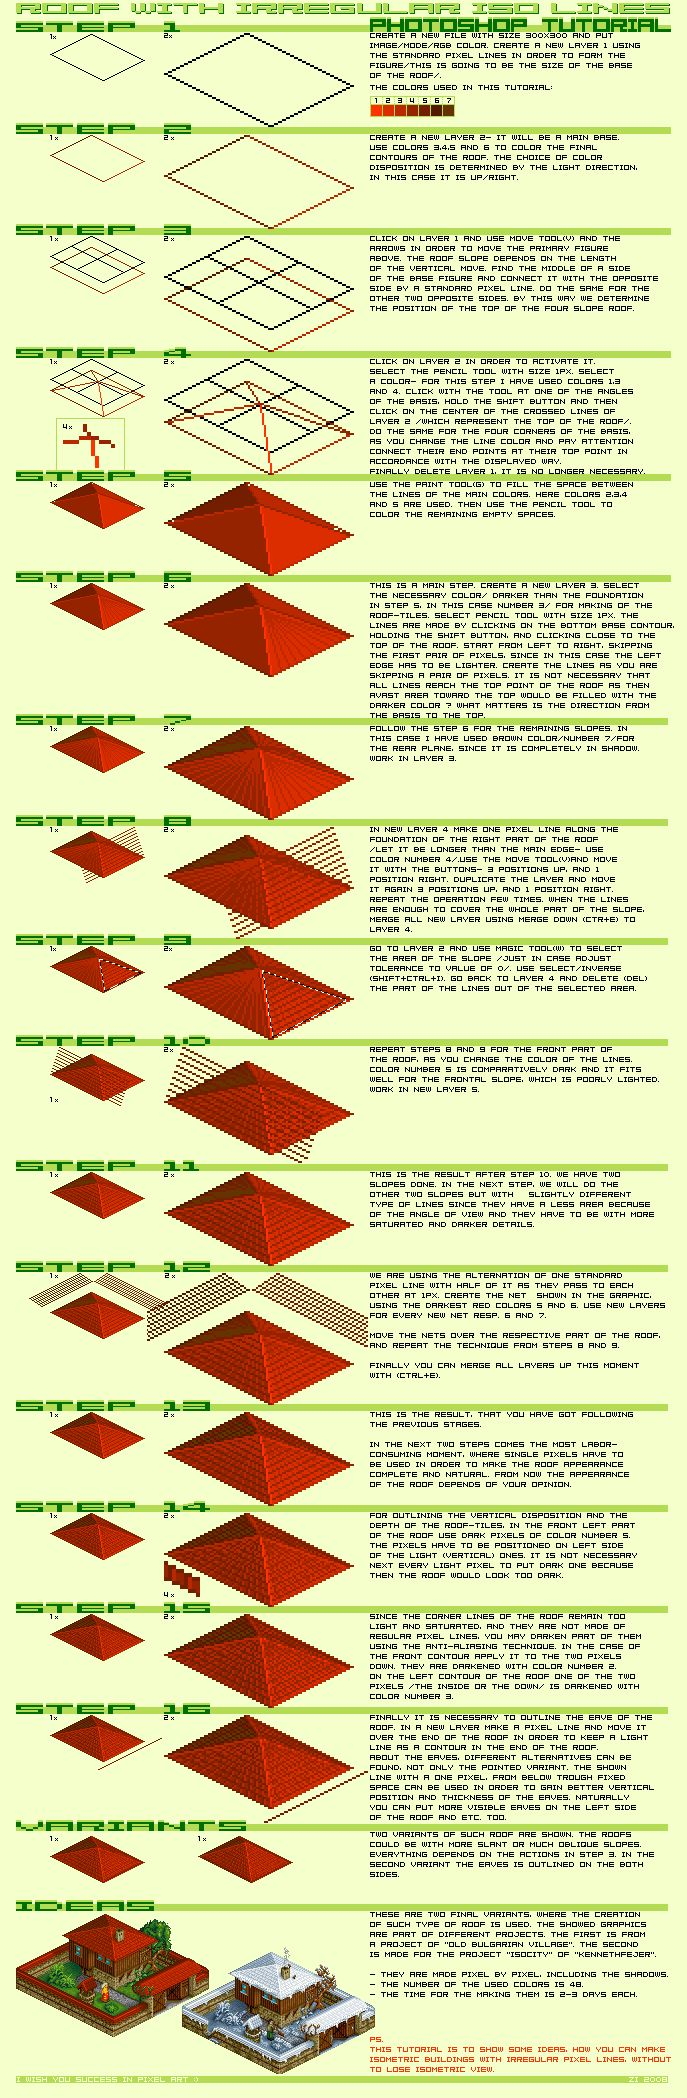 Zi Isometric Pixel Art Tutorial - Roof image http://www.pixeljoint.com/pixels/tutorials.asp?id=2357